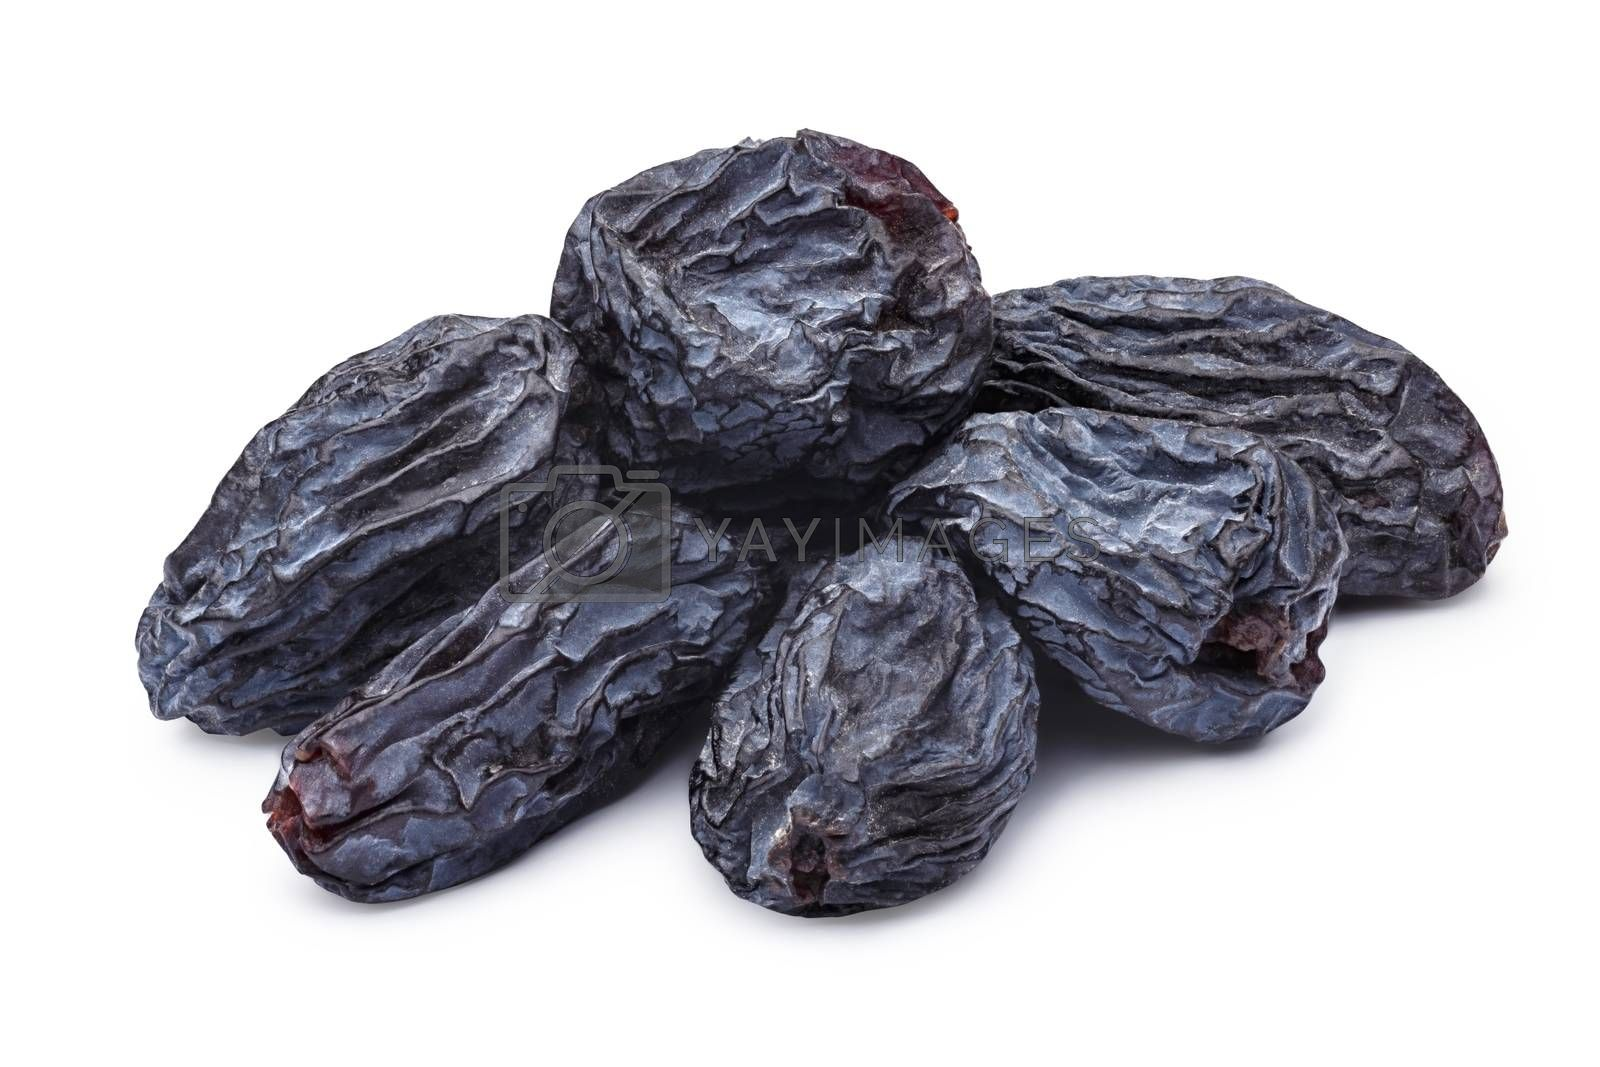 Dark natural seedless raisins (Izabella, Zante Currant, Uzum). Sun-dried untreated grape.Clipping paths, infininte depth of field